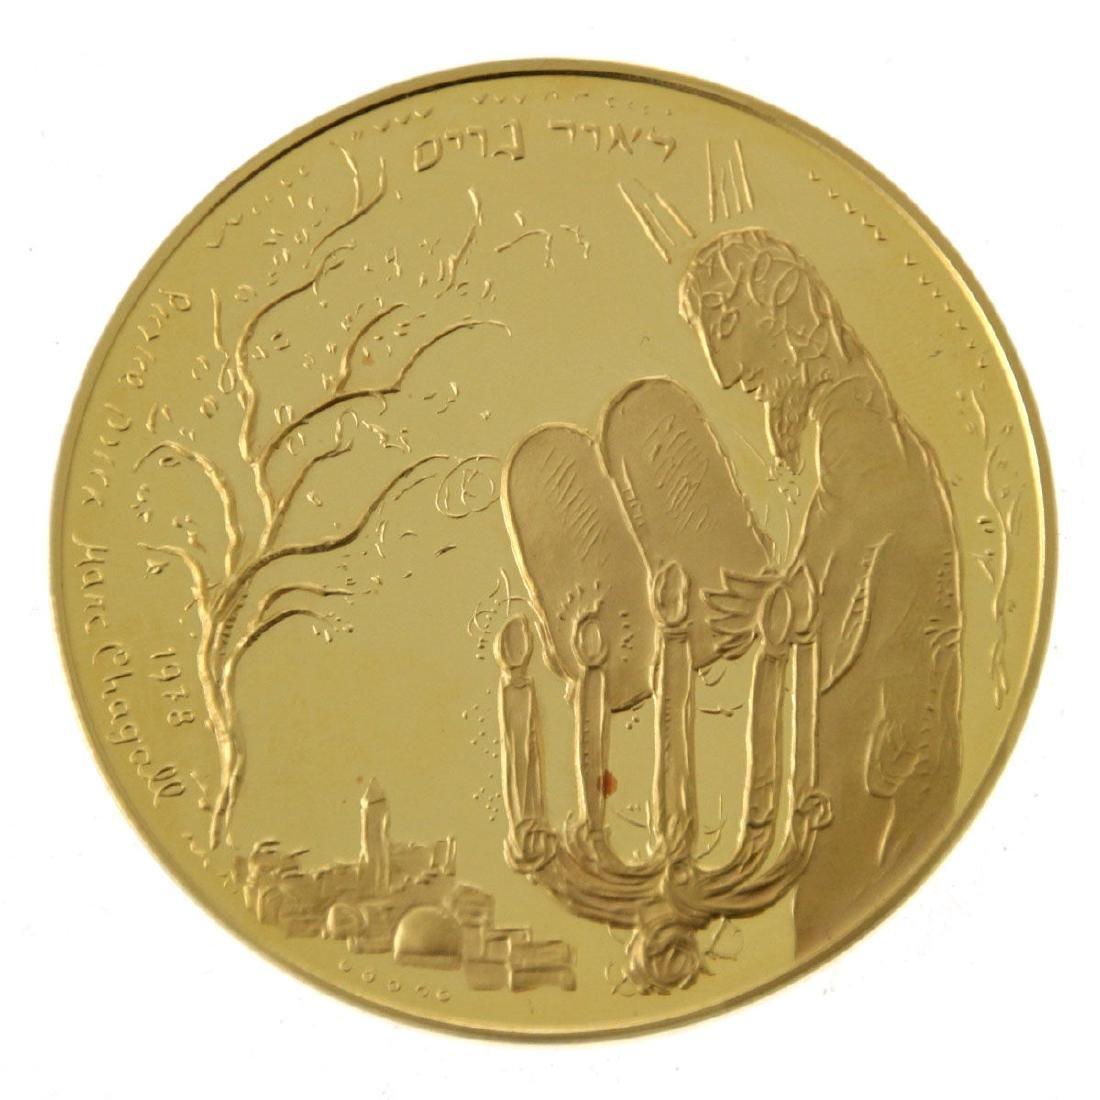 Marc Chagall 22k Gold Medal, Korat Gag, 1978.